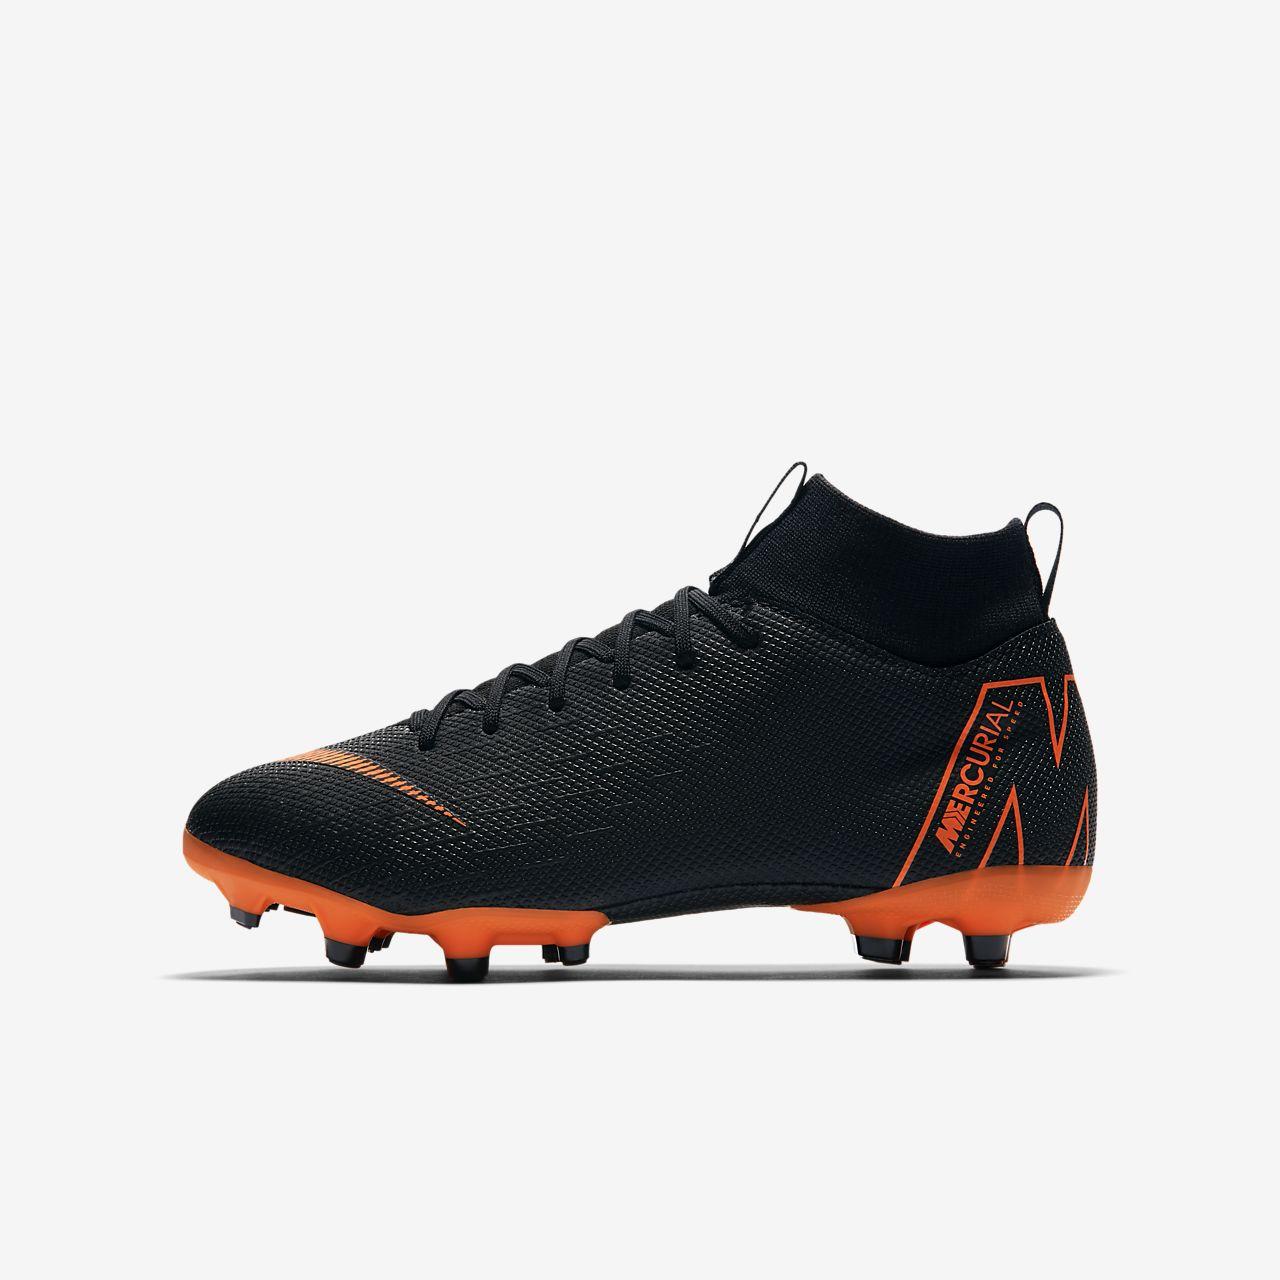 ... Scarpa da calcio multiterreno Nike Jr. Superfly VI Academy MG -  Bambini/Ragazzi